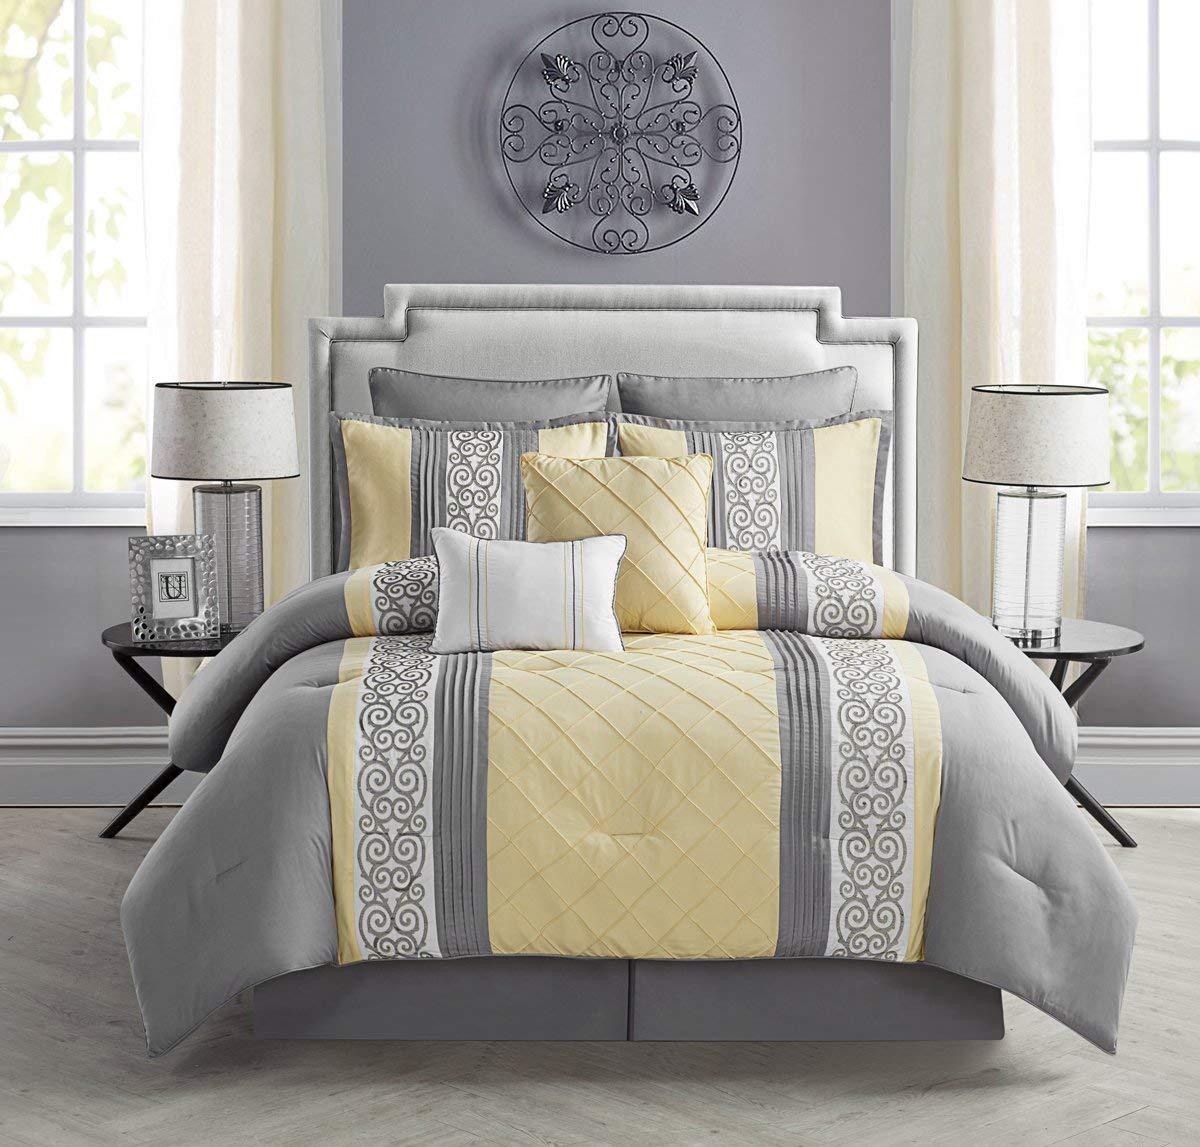 VCNY 8 Piece Farion Comforter Set, Queen, Yellow